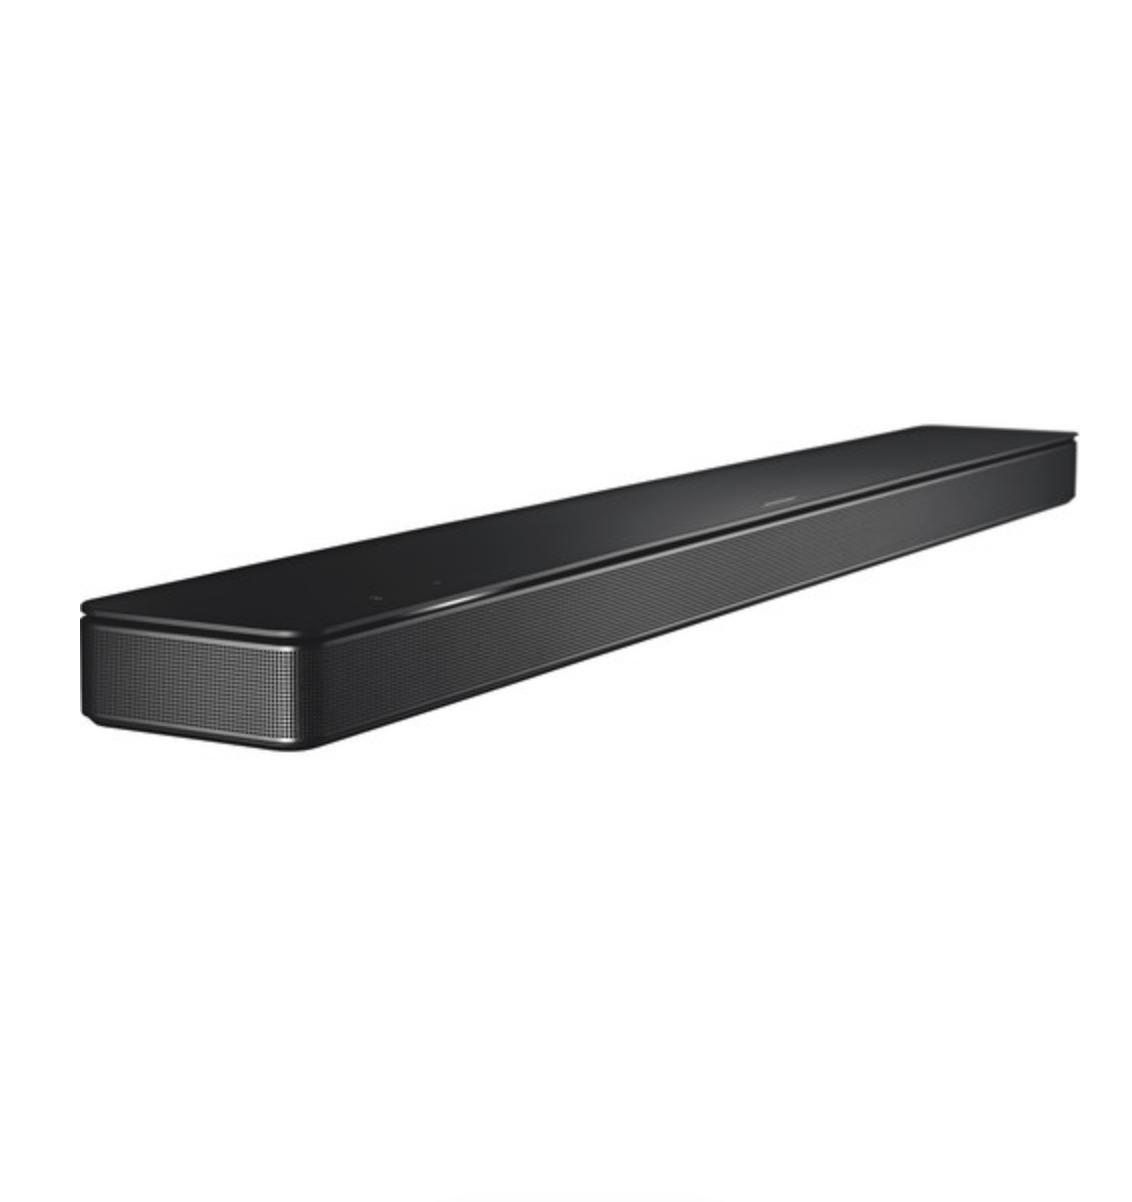 Bose Soundbar 500 Bluetooth Wireless